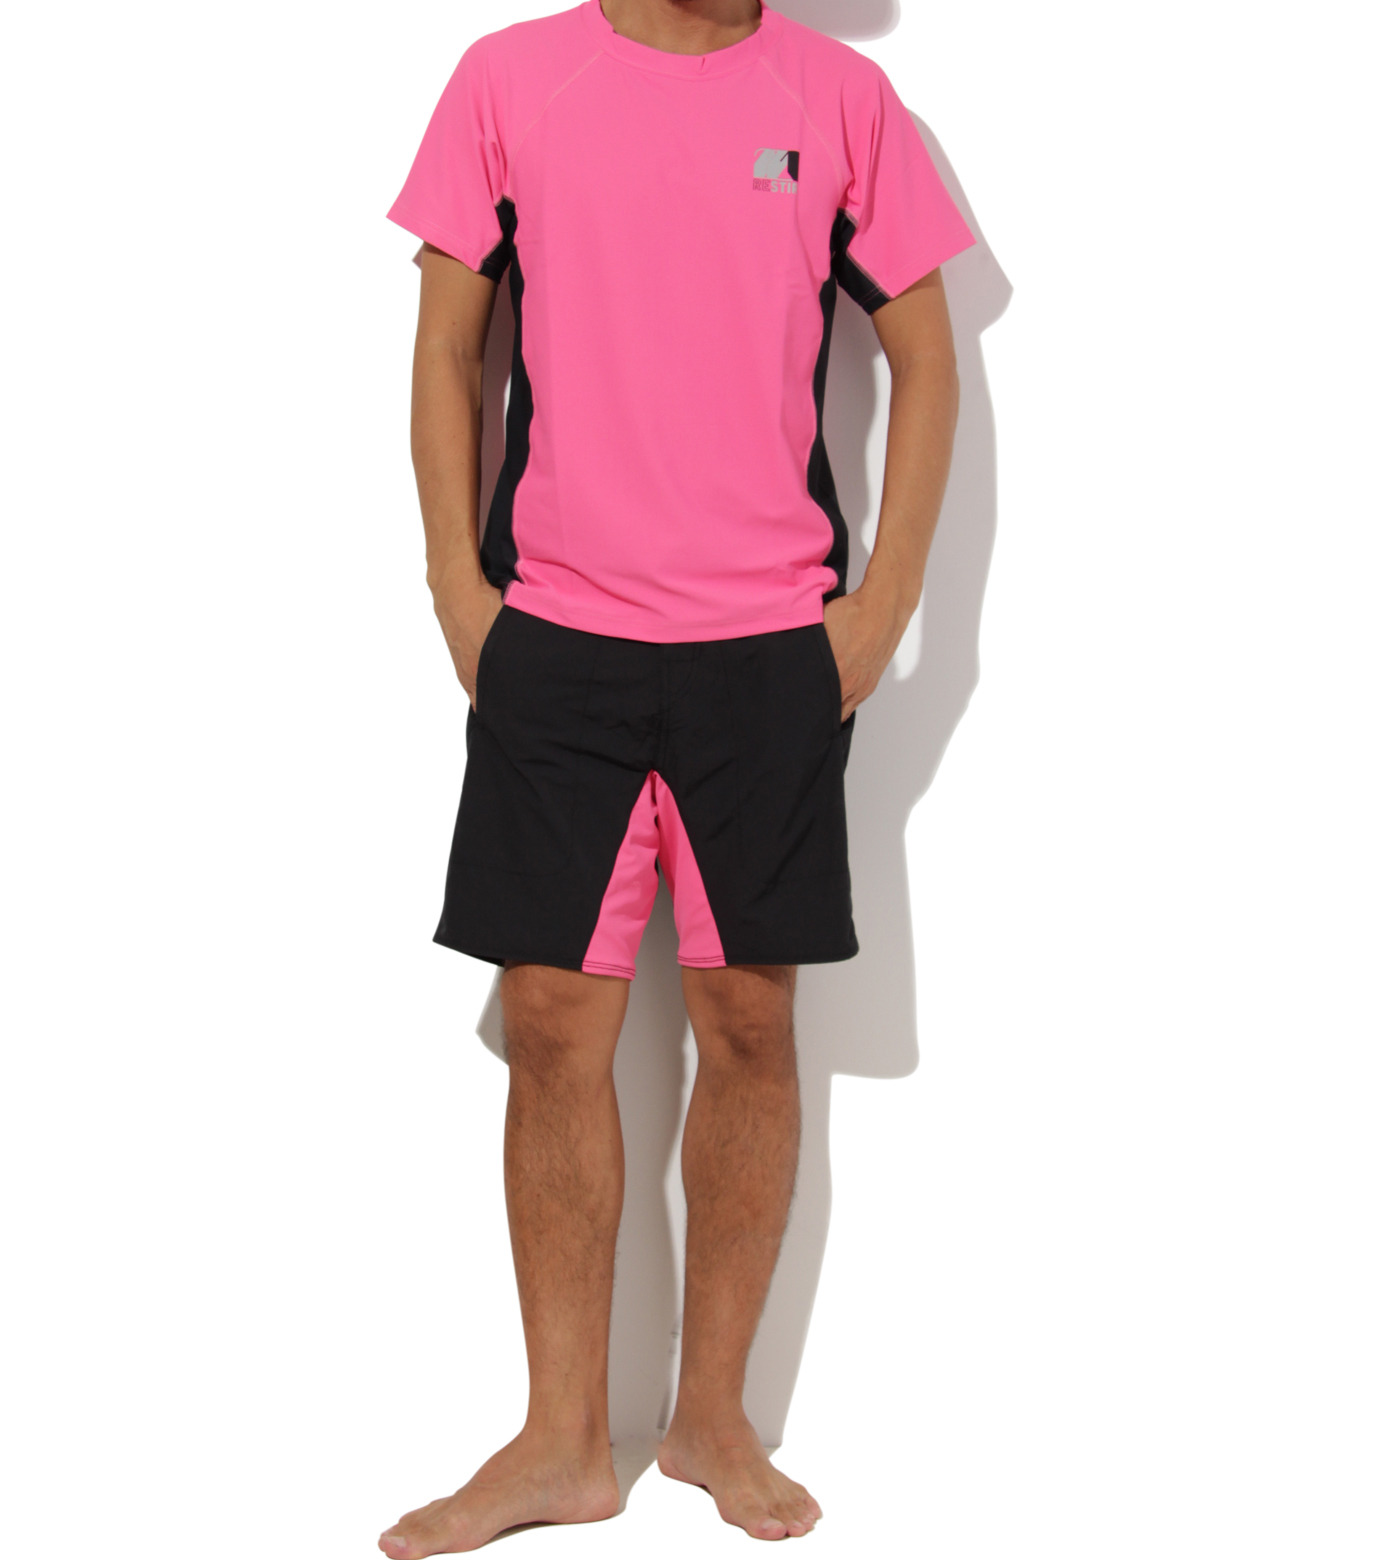 TWO TWO ONE(トゥートゥーワン)のSurf shorts short-PINK(SWIMWEAR/SWIMWEAR)-15N948001-72 拡大詳細画像5